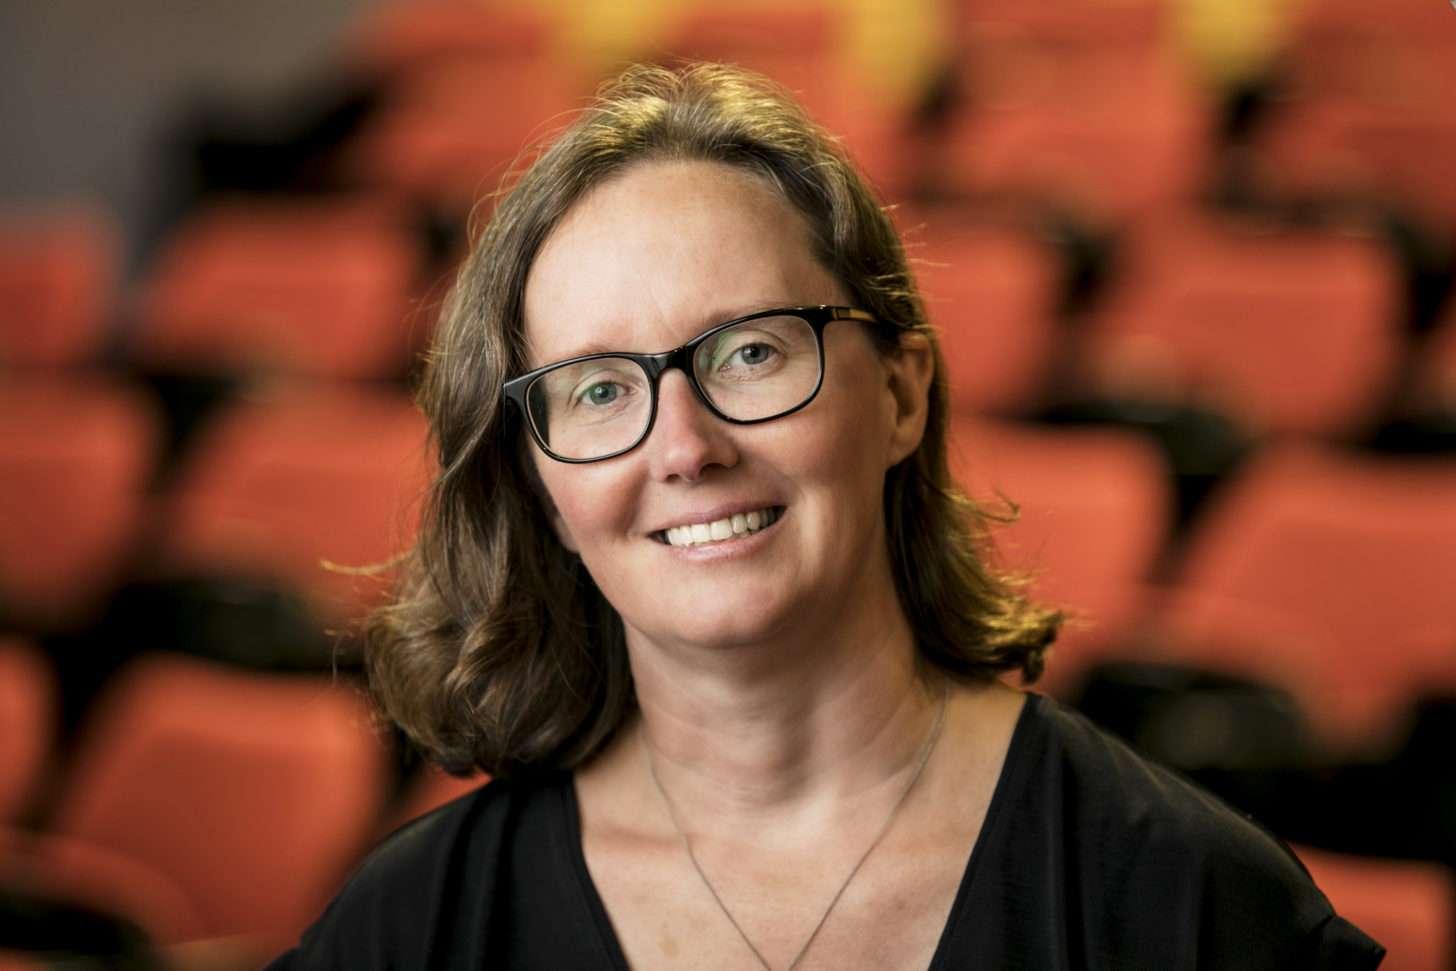 Dr Sarah Pearce